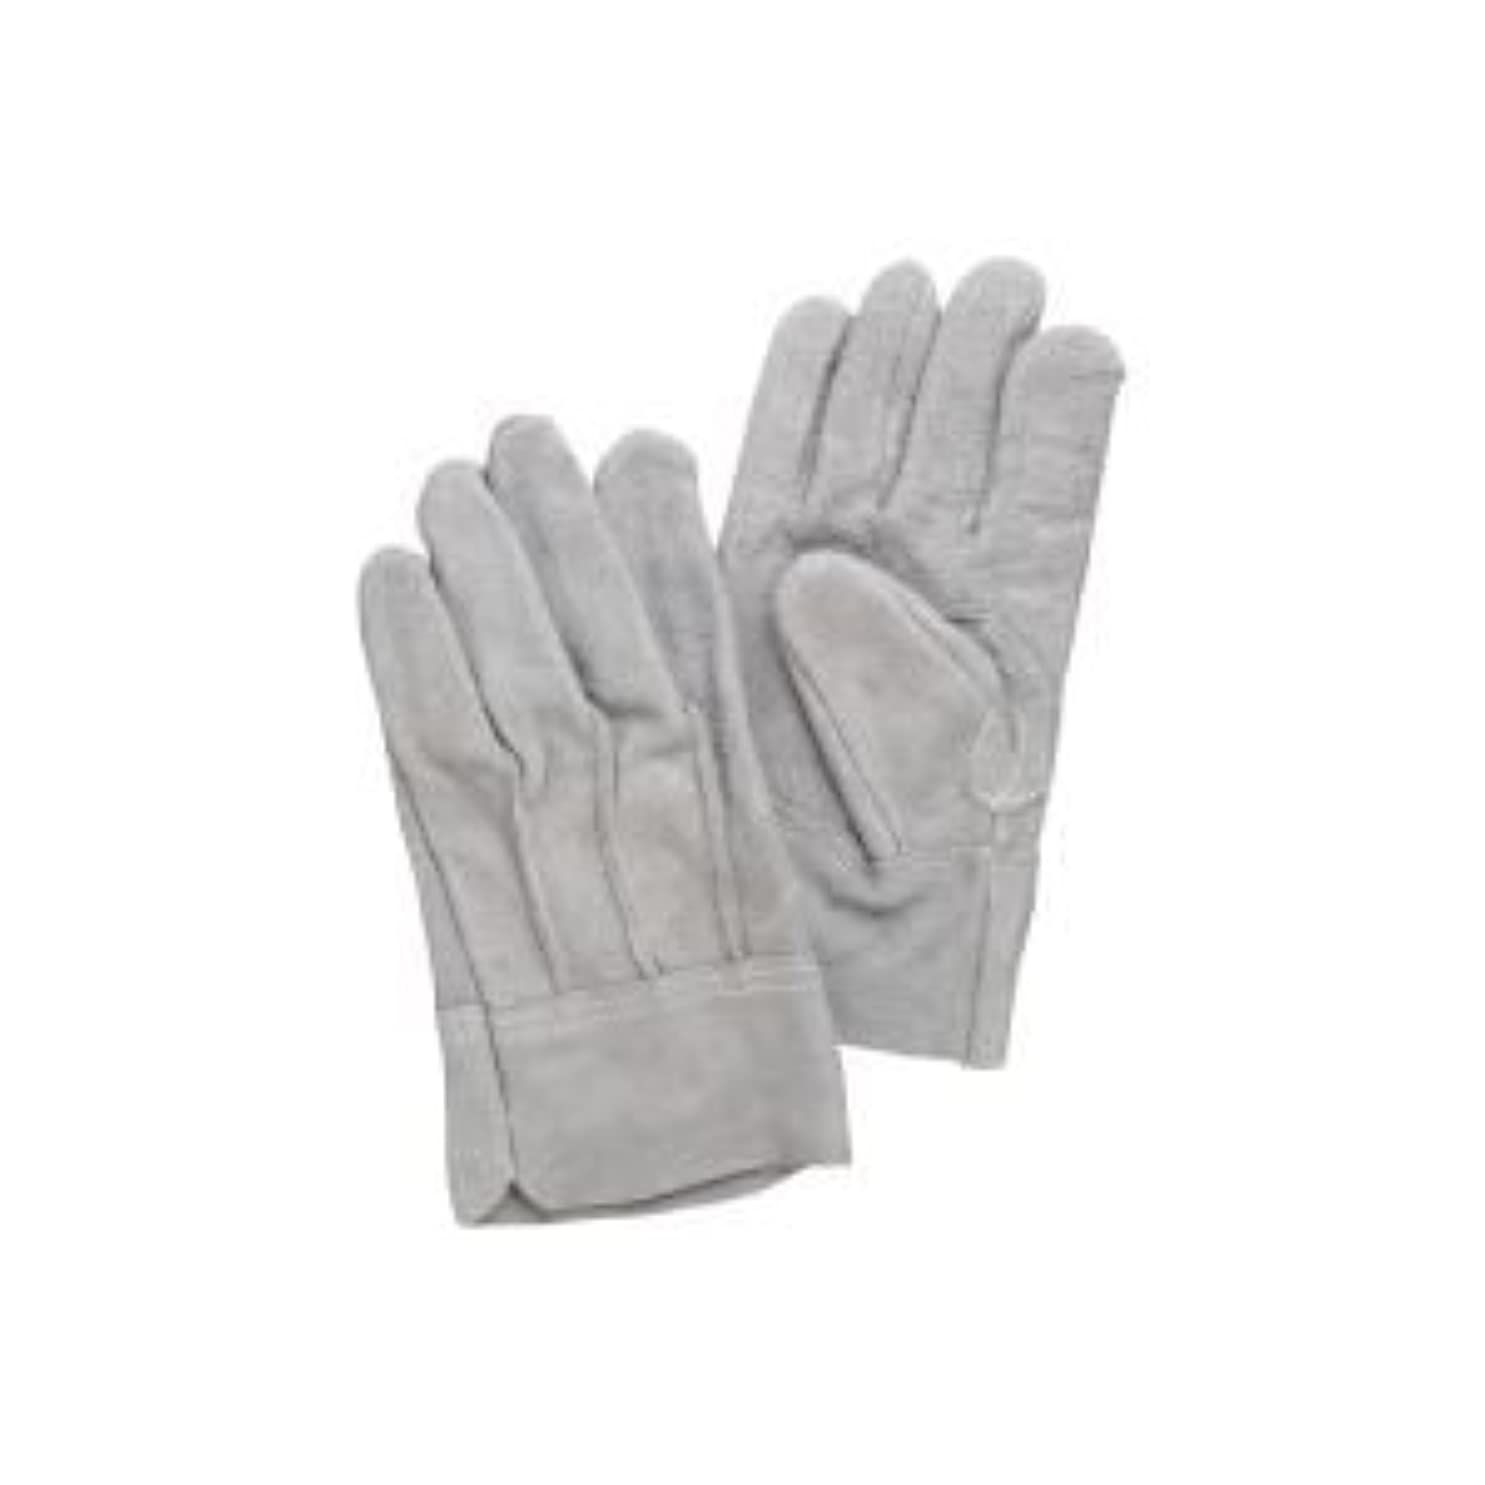 先住民節約社会主義者( お徳用 100セット ) 熱田資材 革手袋床革手袋 背縫い NO.11 グレー